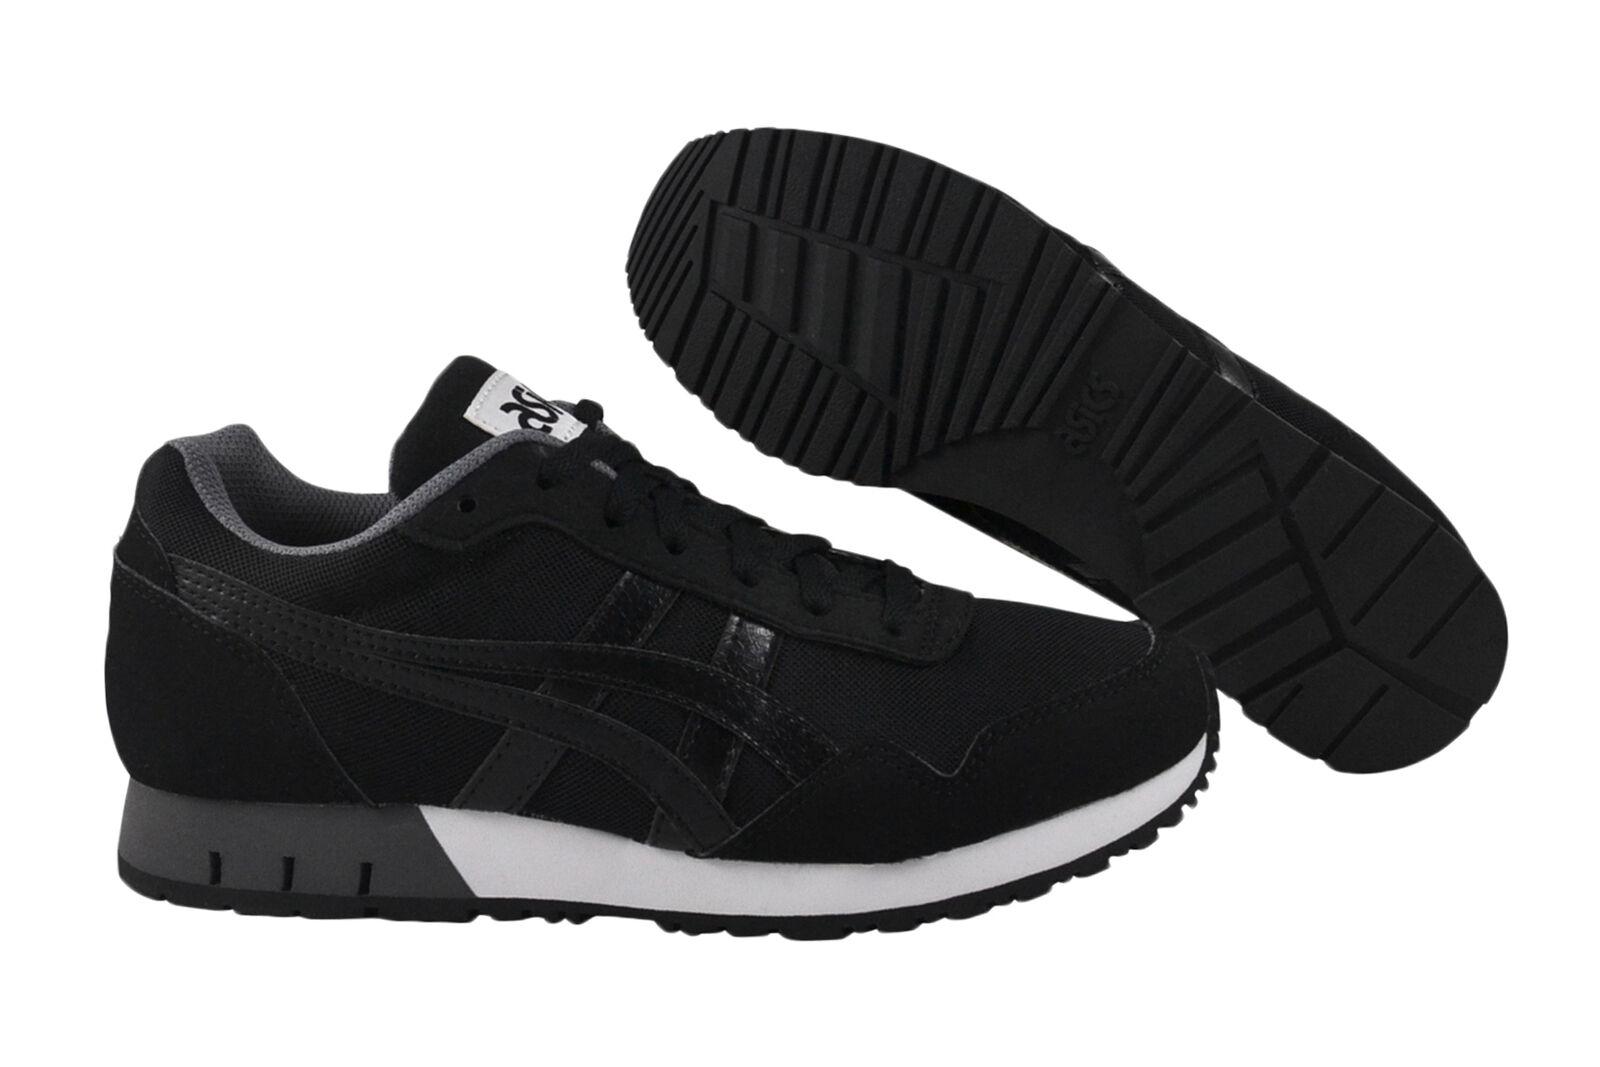 Asics Curreo black/black Sneaker/Schuhe HN537 9090 schwarz